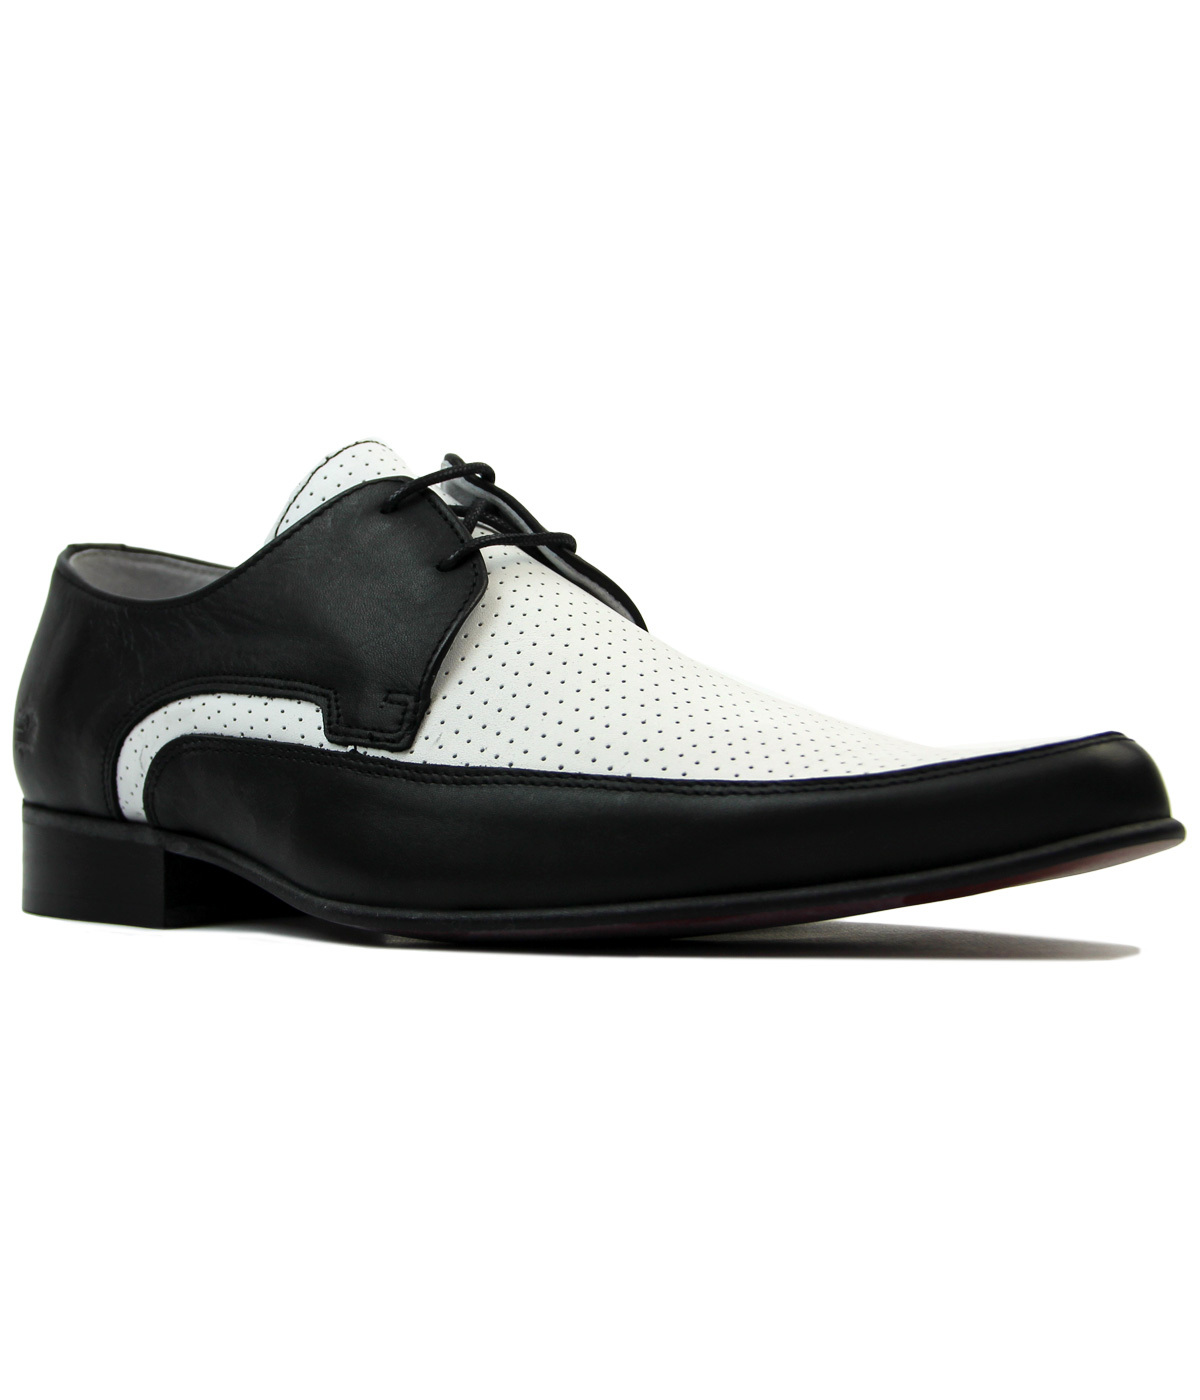 Jam Shoes IKON ORIGINAL  2-Tone Mod Shoes